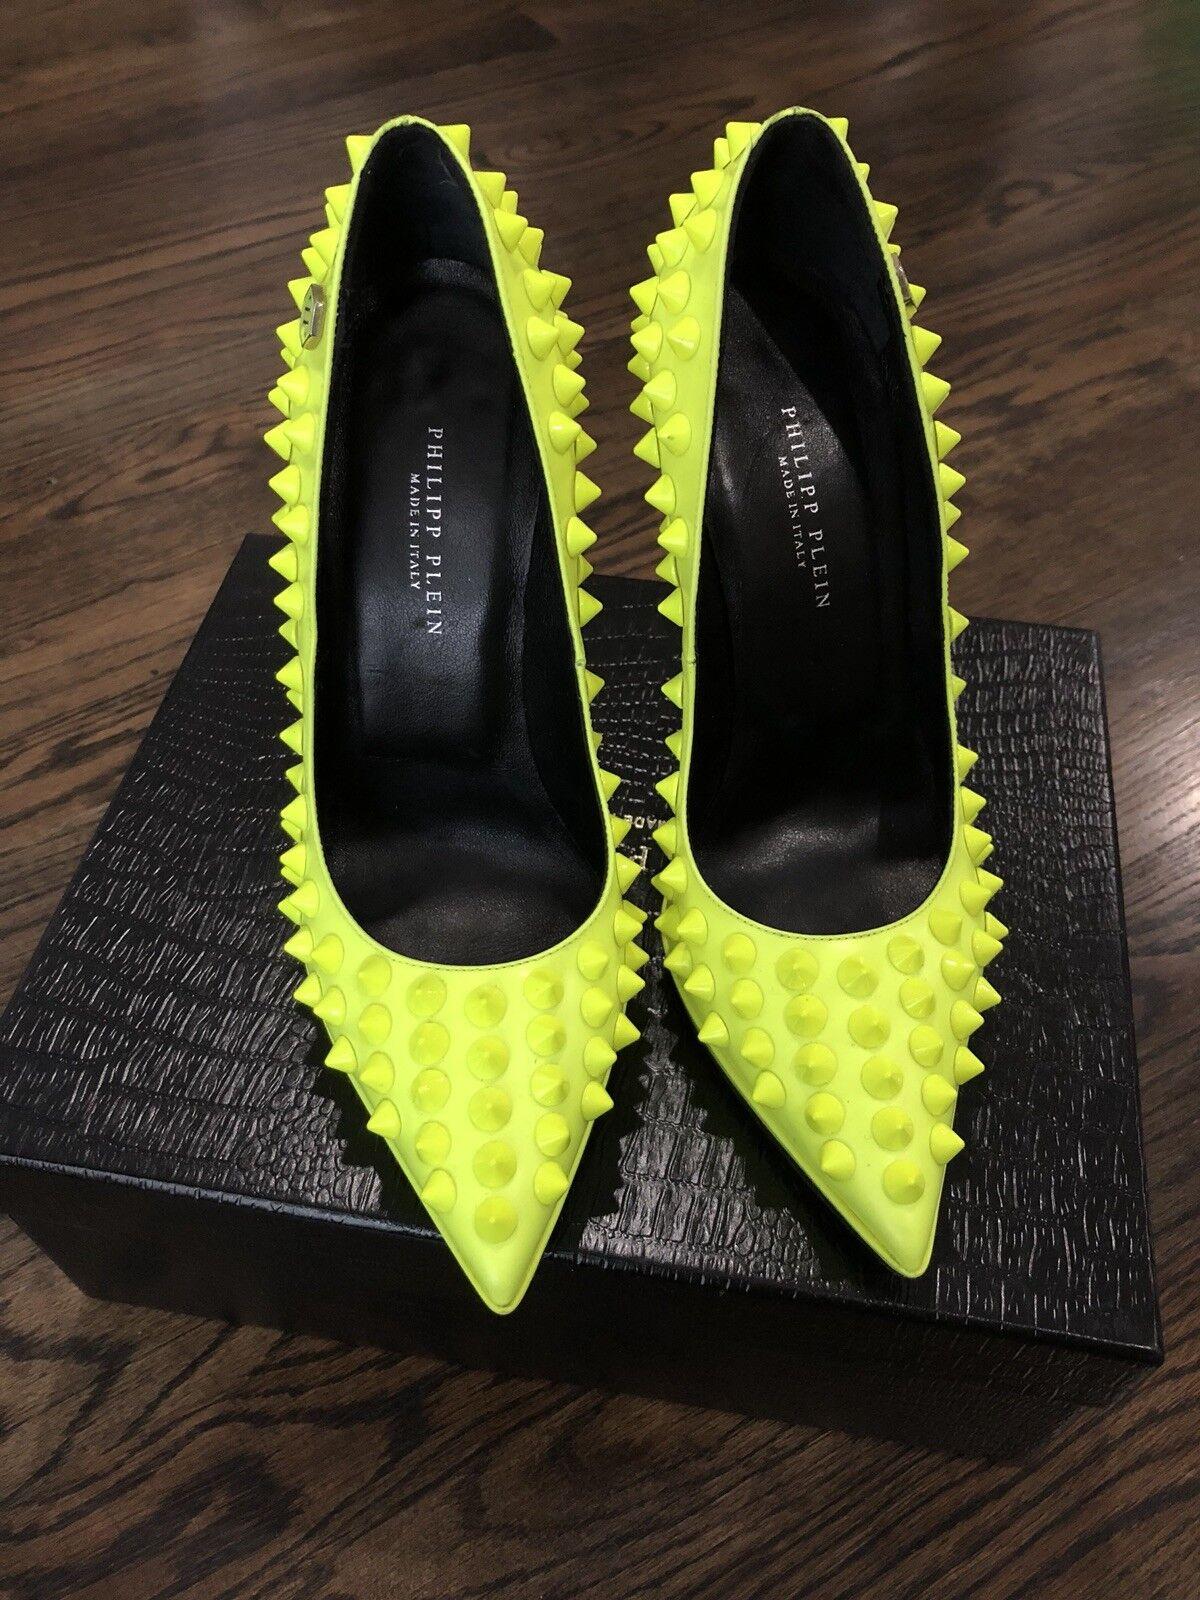 Philipp Philipp Philipp Plein  1495 Authentic Neon jaune High Heels Pop Studed Pumps Taille 37 7afc1e